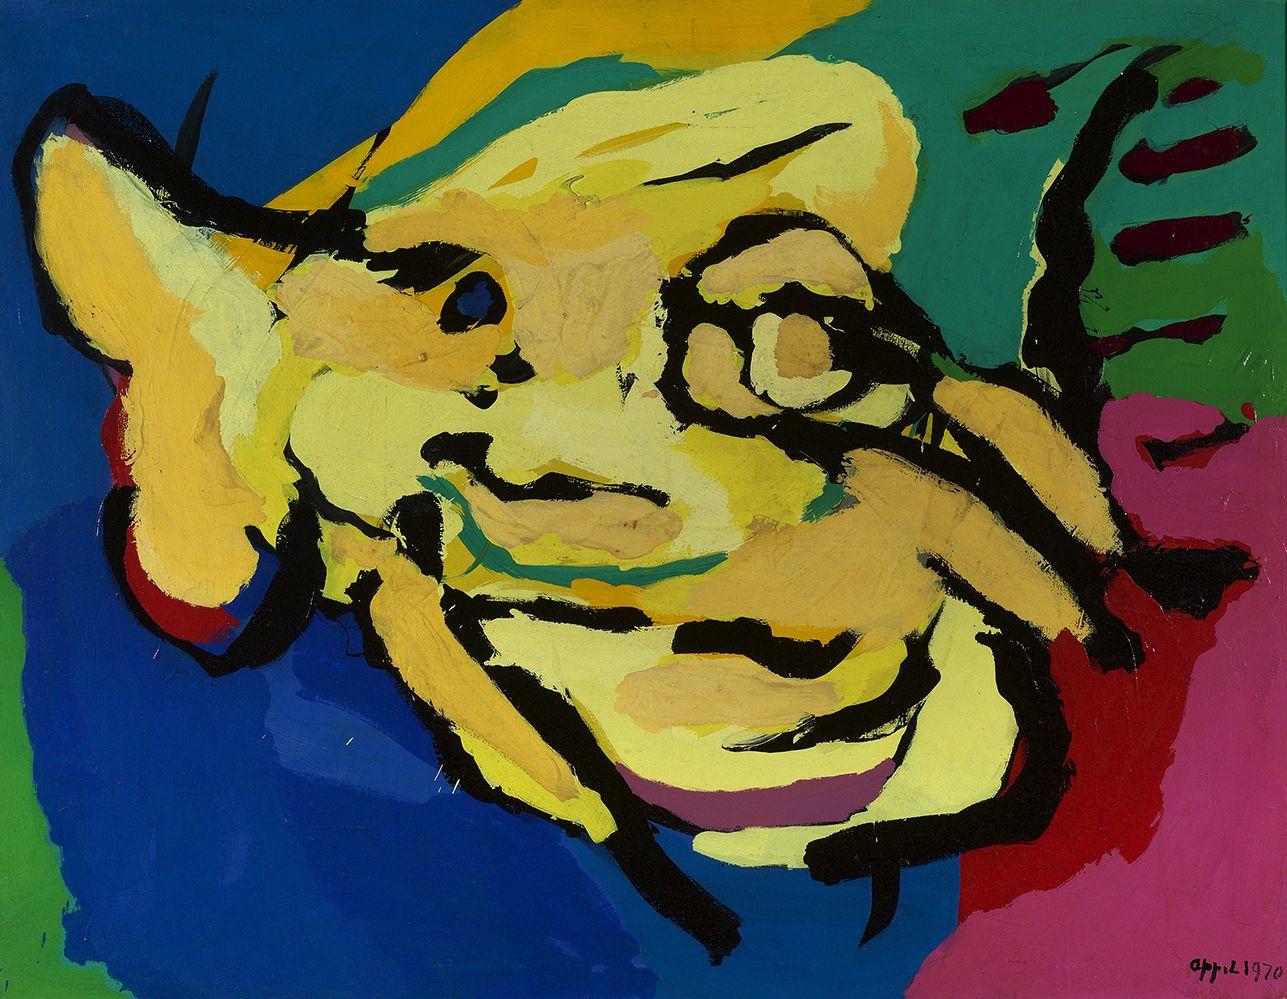 Karel Appel (1921-2006), The Flying Yellow Head, 1970